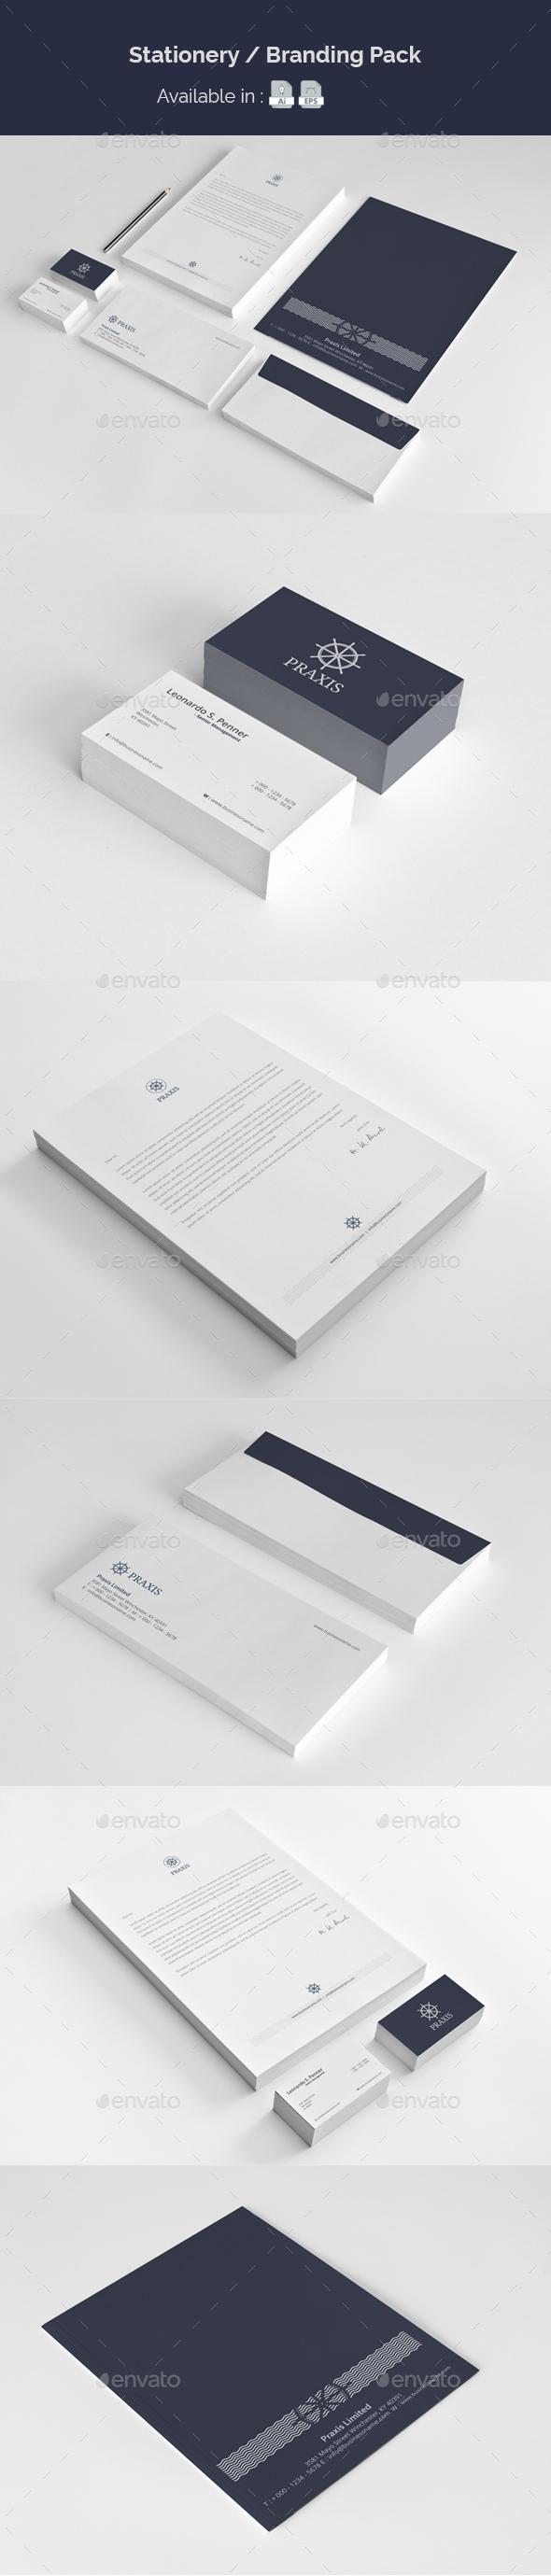 Stationery / Branding Pack - Stationery Print Templates